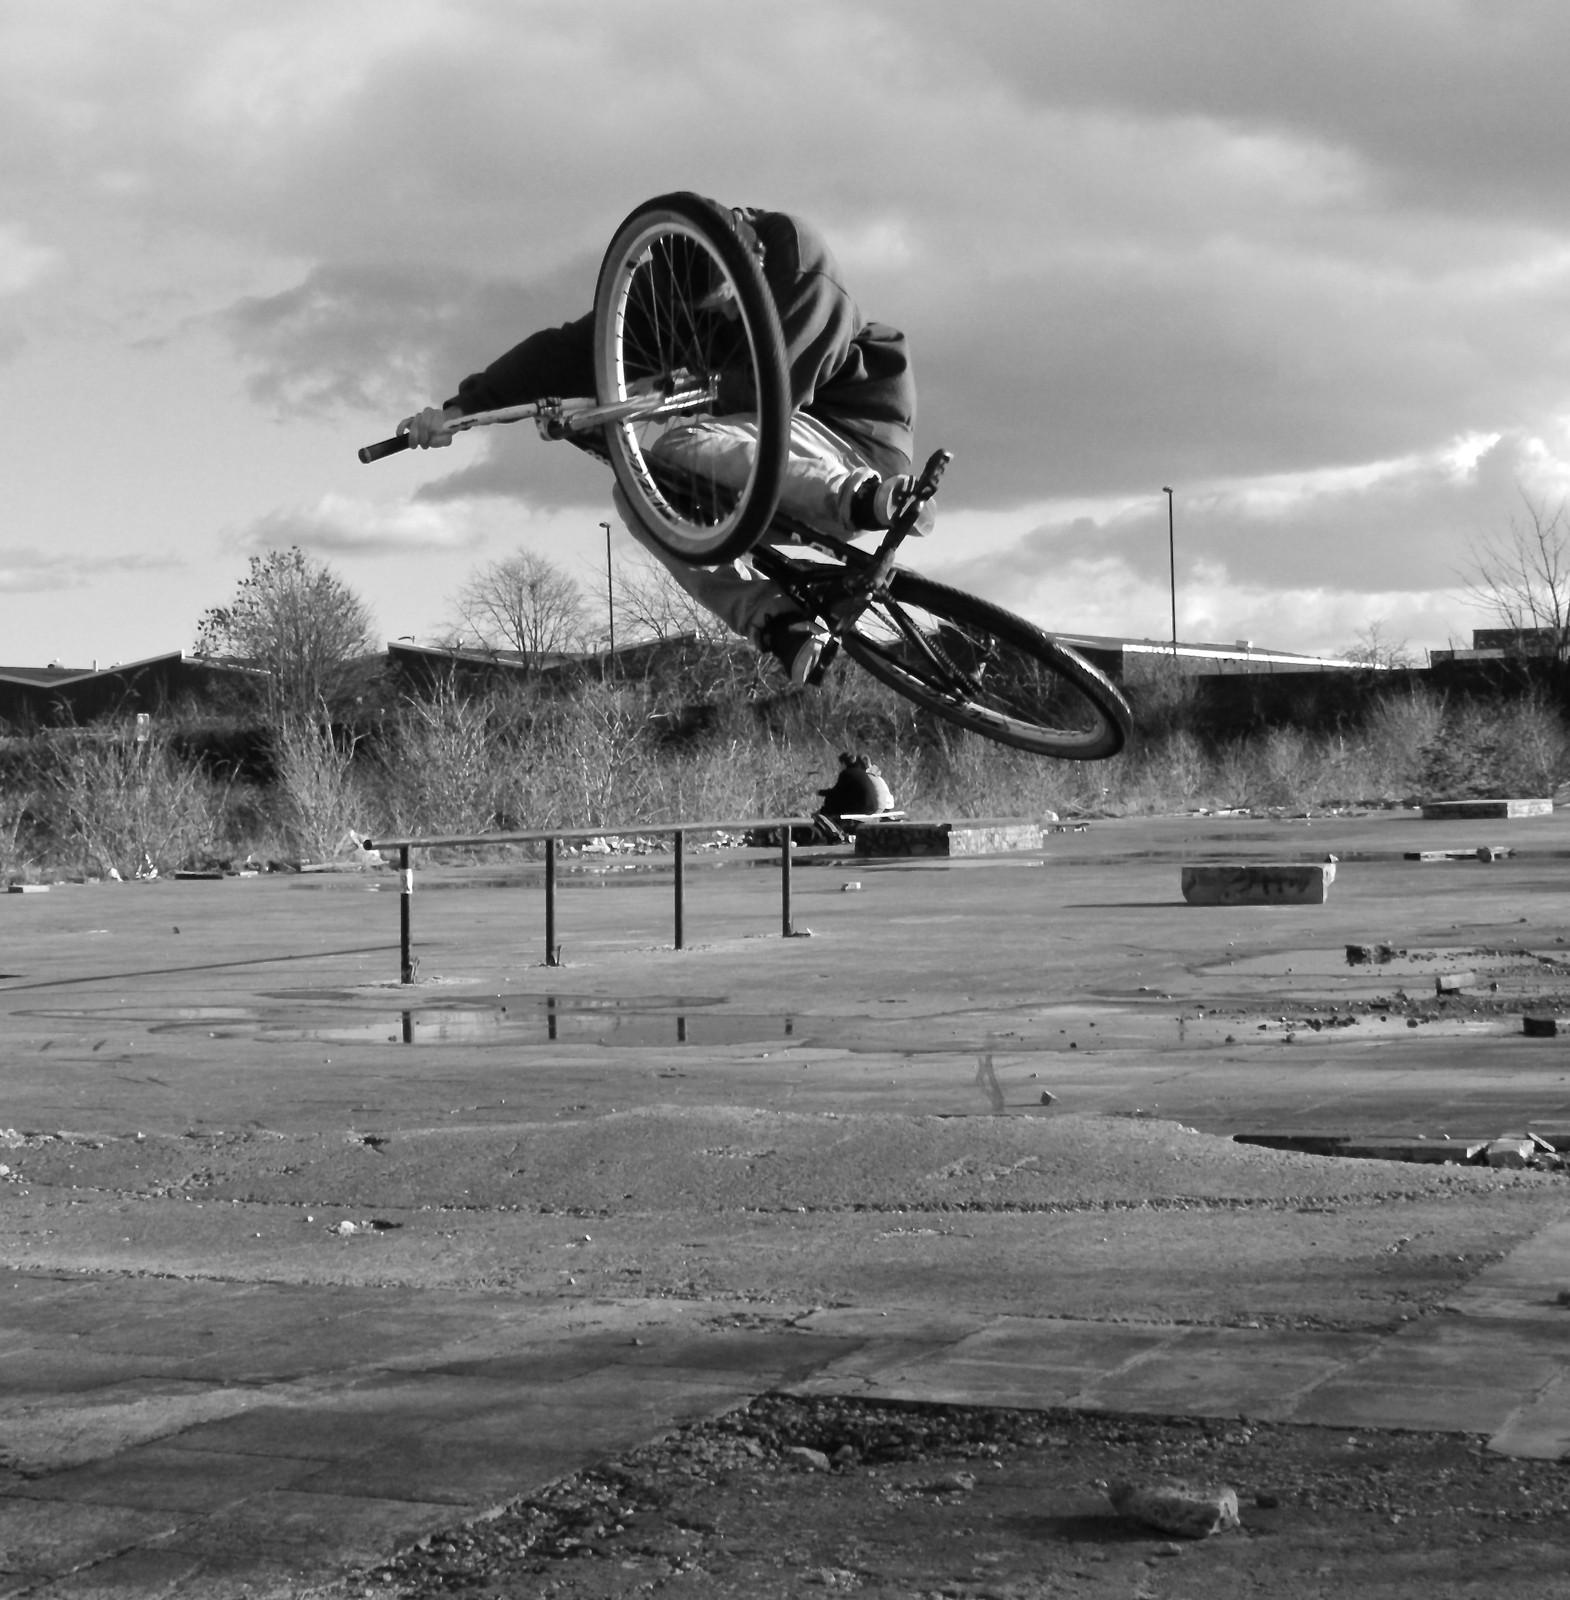 Bunnyhop table  - Tom_kilcoyne - Mountain Biking Pictures - Vital MTB